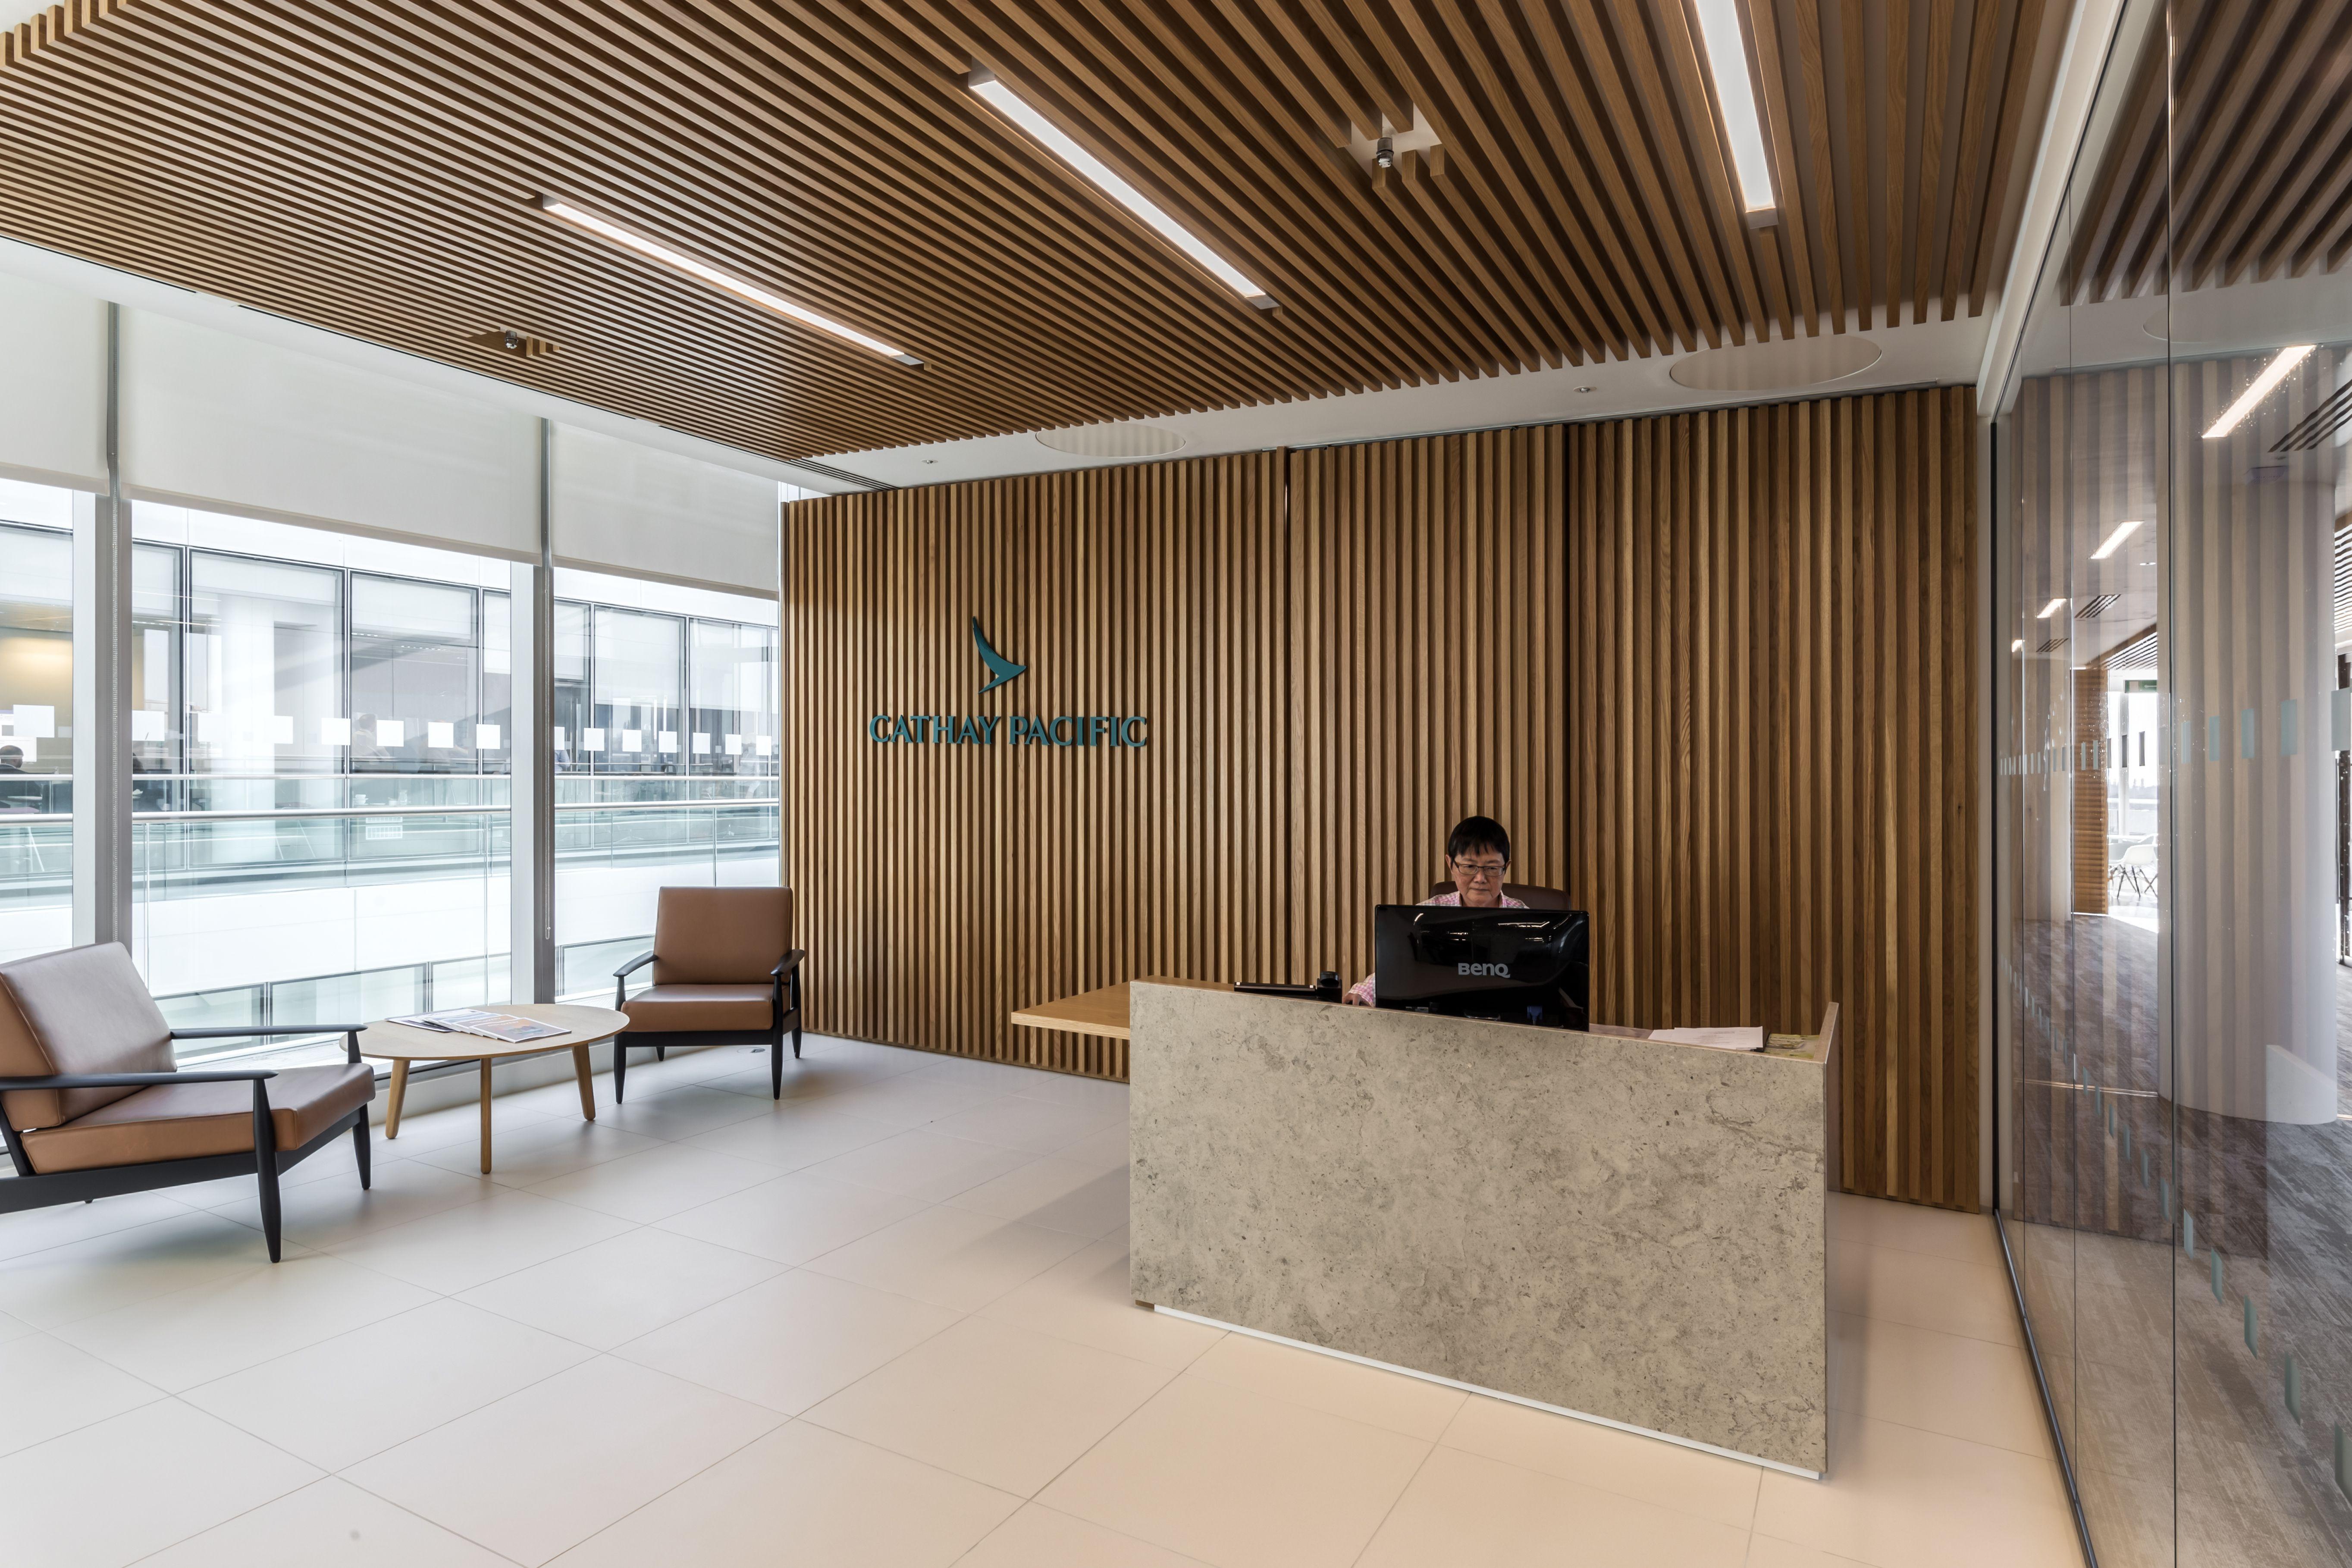 office foyer designs. Explore Reception Counter, Entry Foyer, And More! Office Foyer Designs A